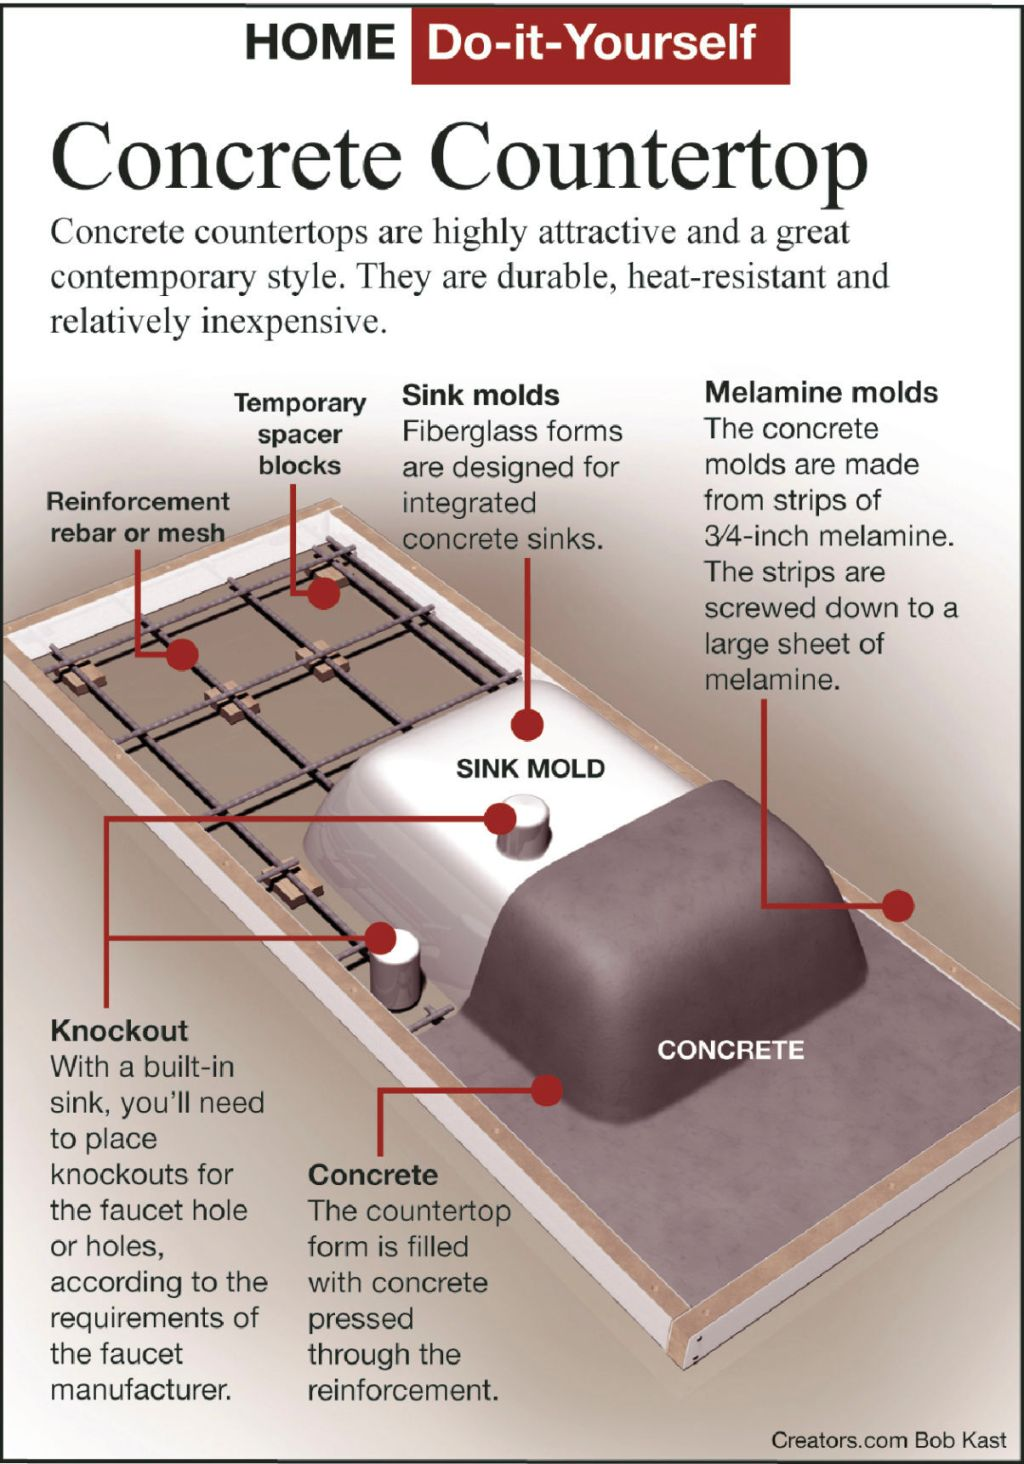 durable concrete countertops are easy